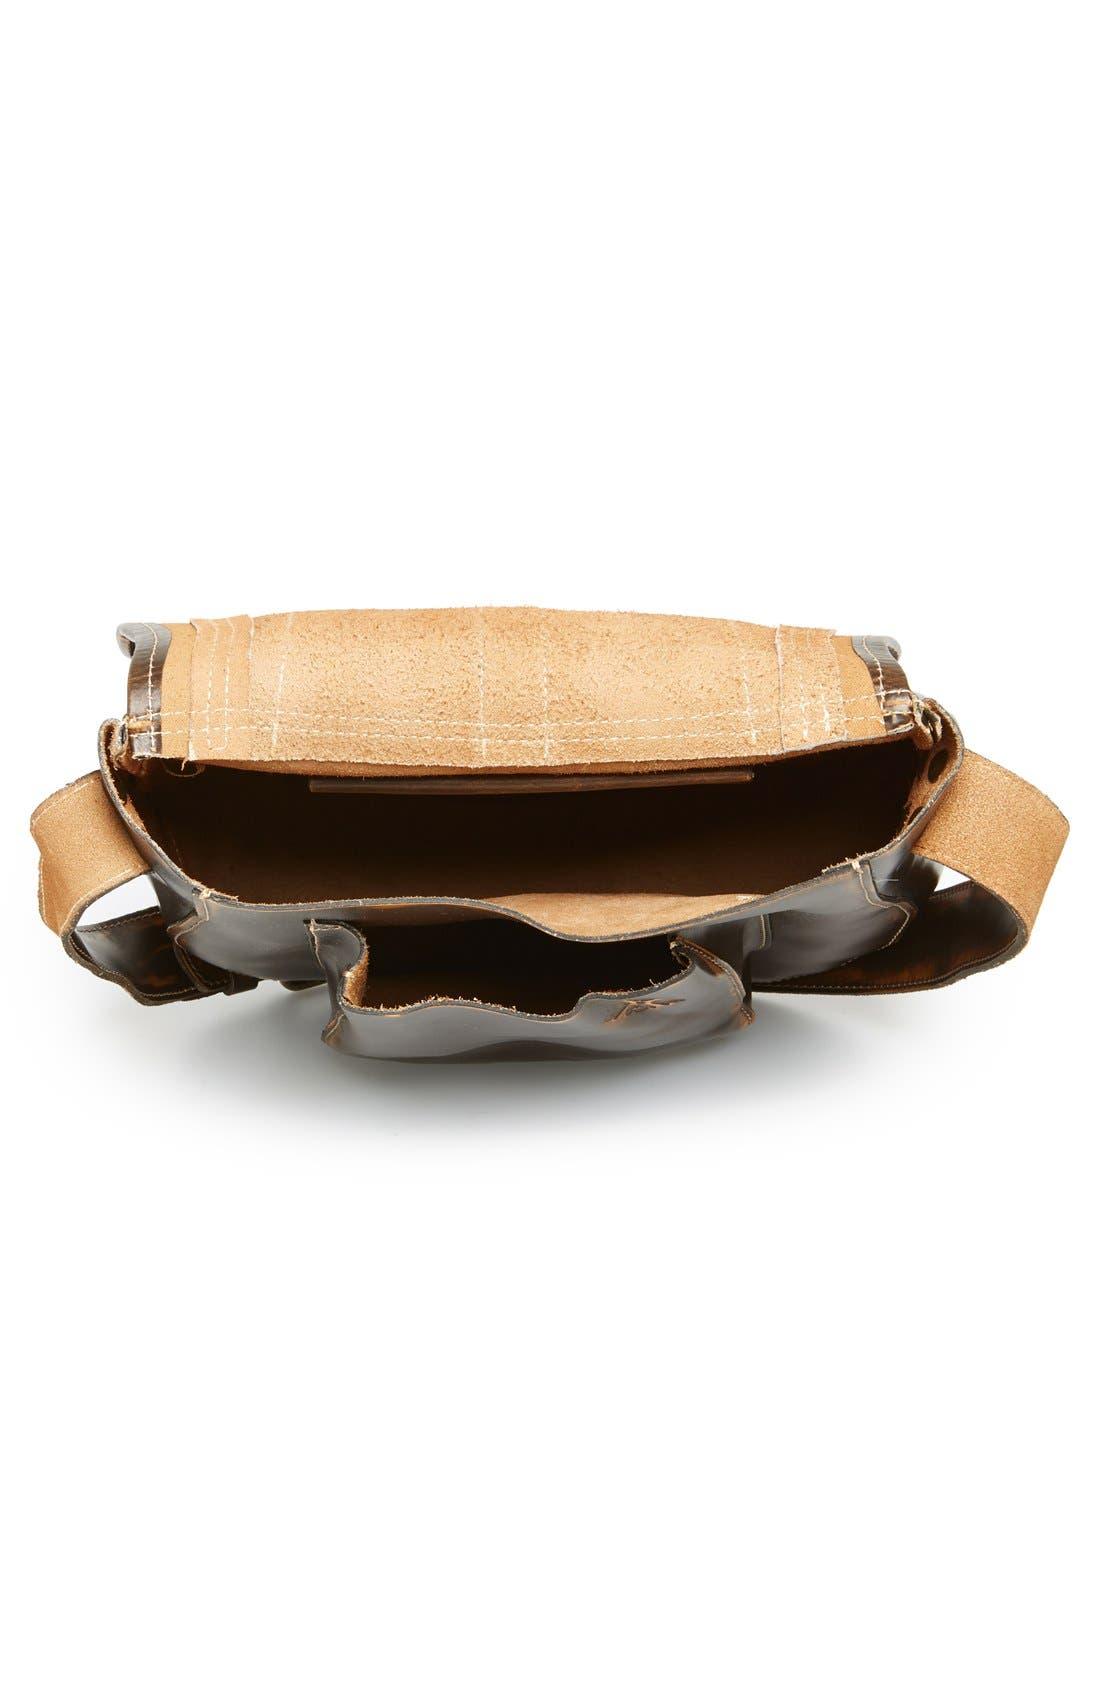 Alternate Image 3  - Patricia Nash 'Barcellona' Leather Crossbody Bag